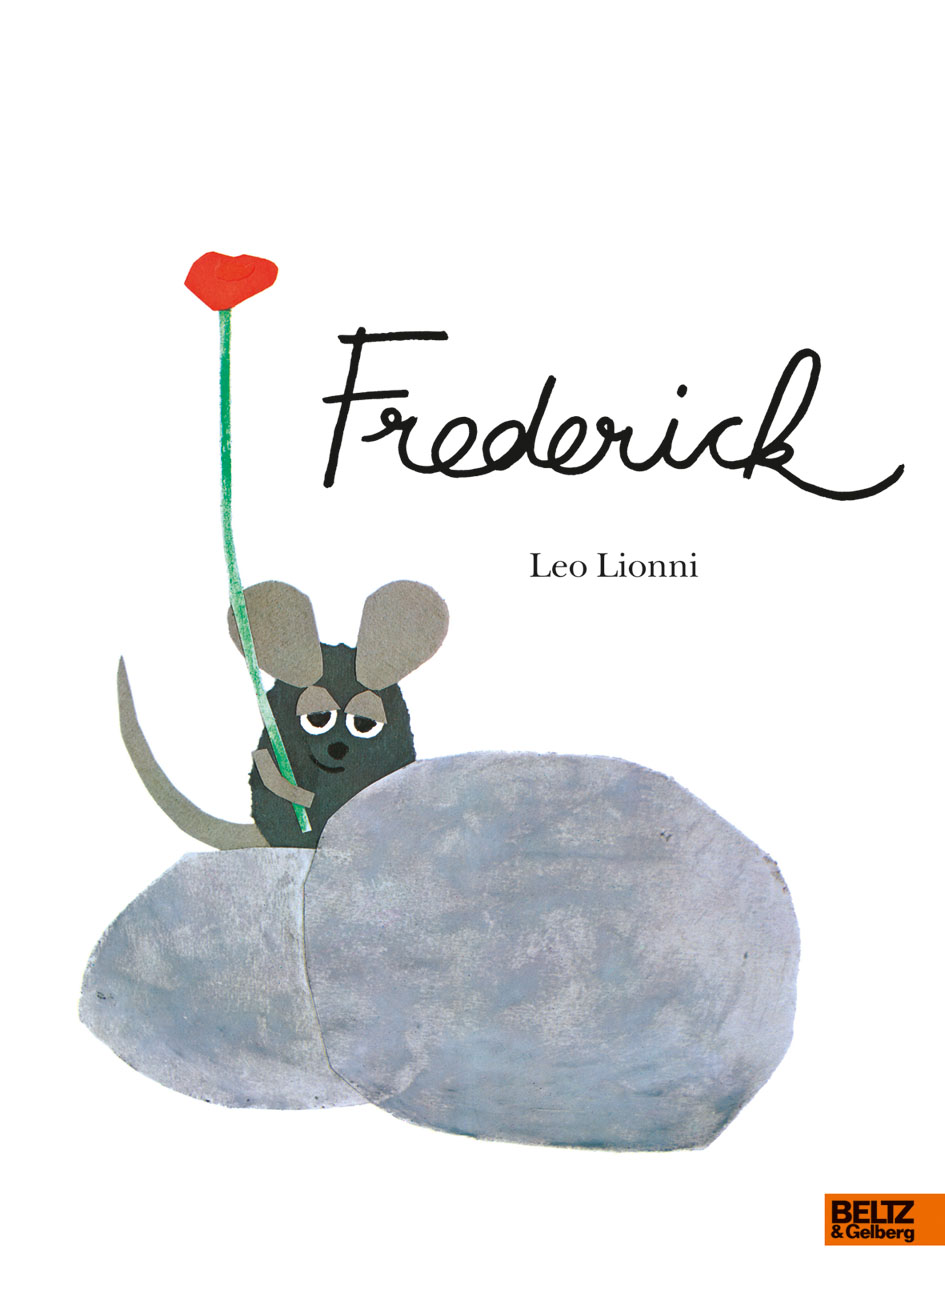 Frederick - - Leo Lionni | BELTZ